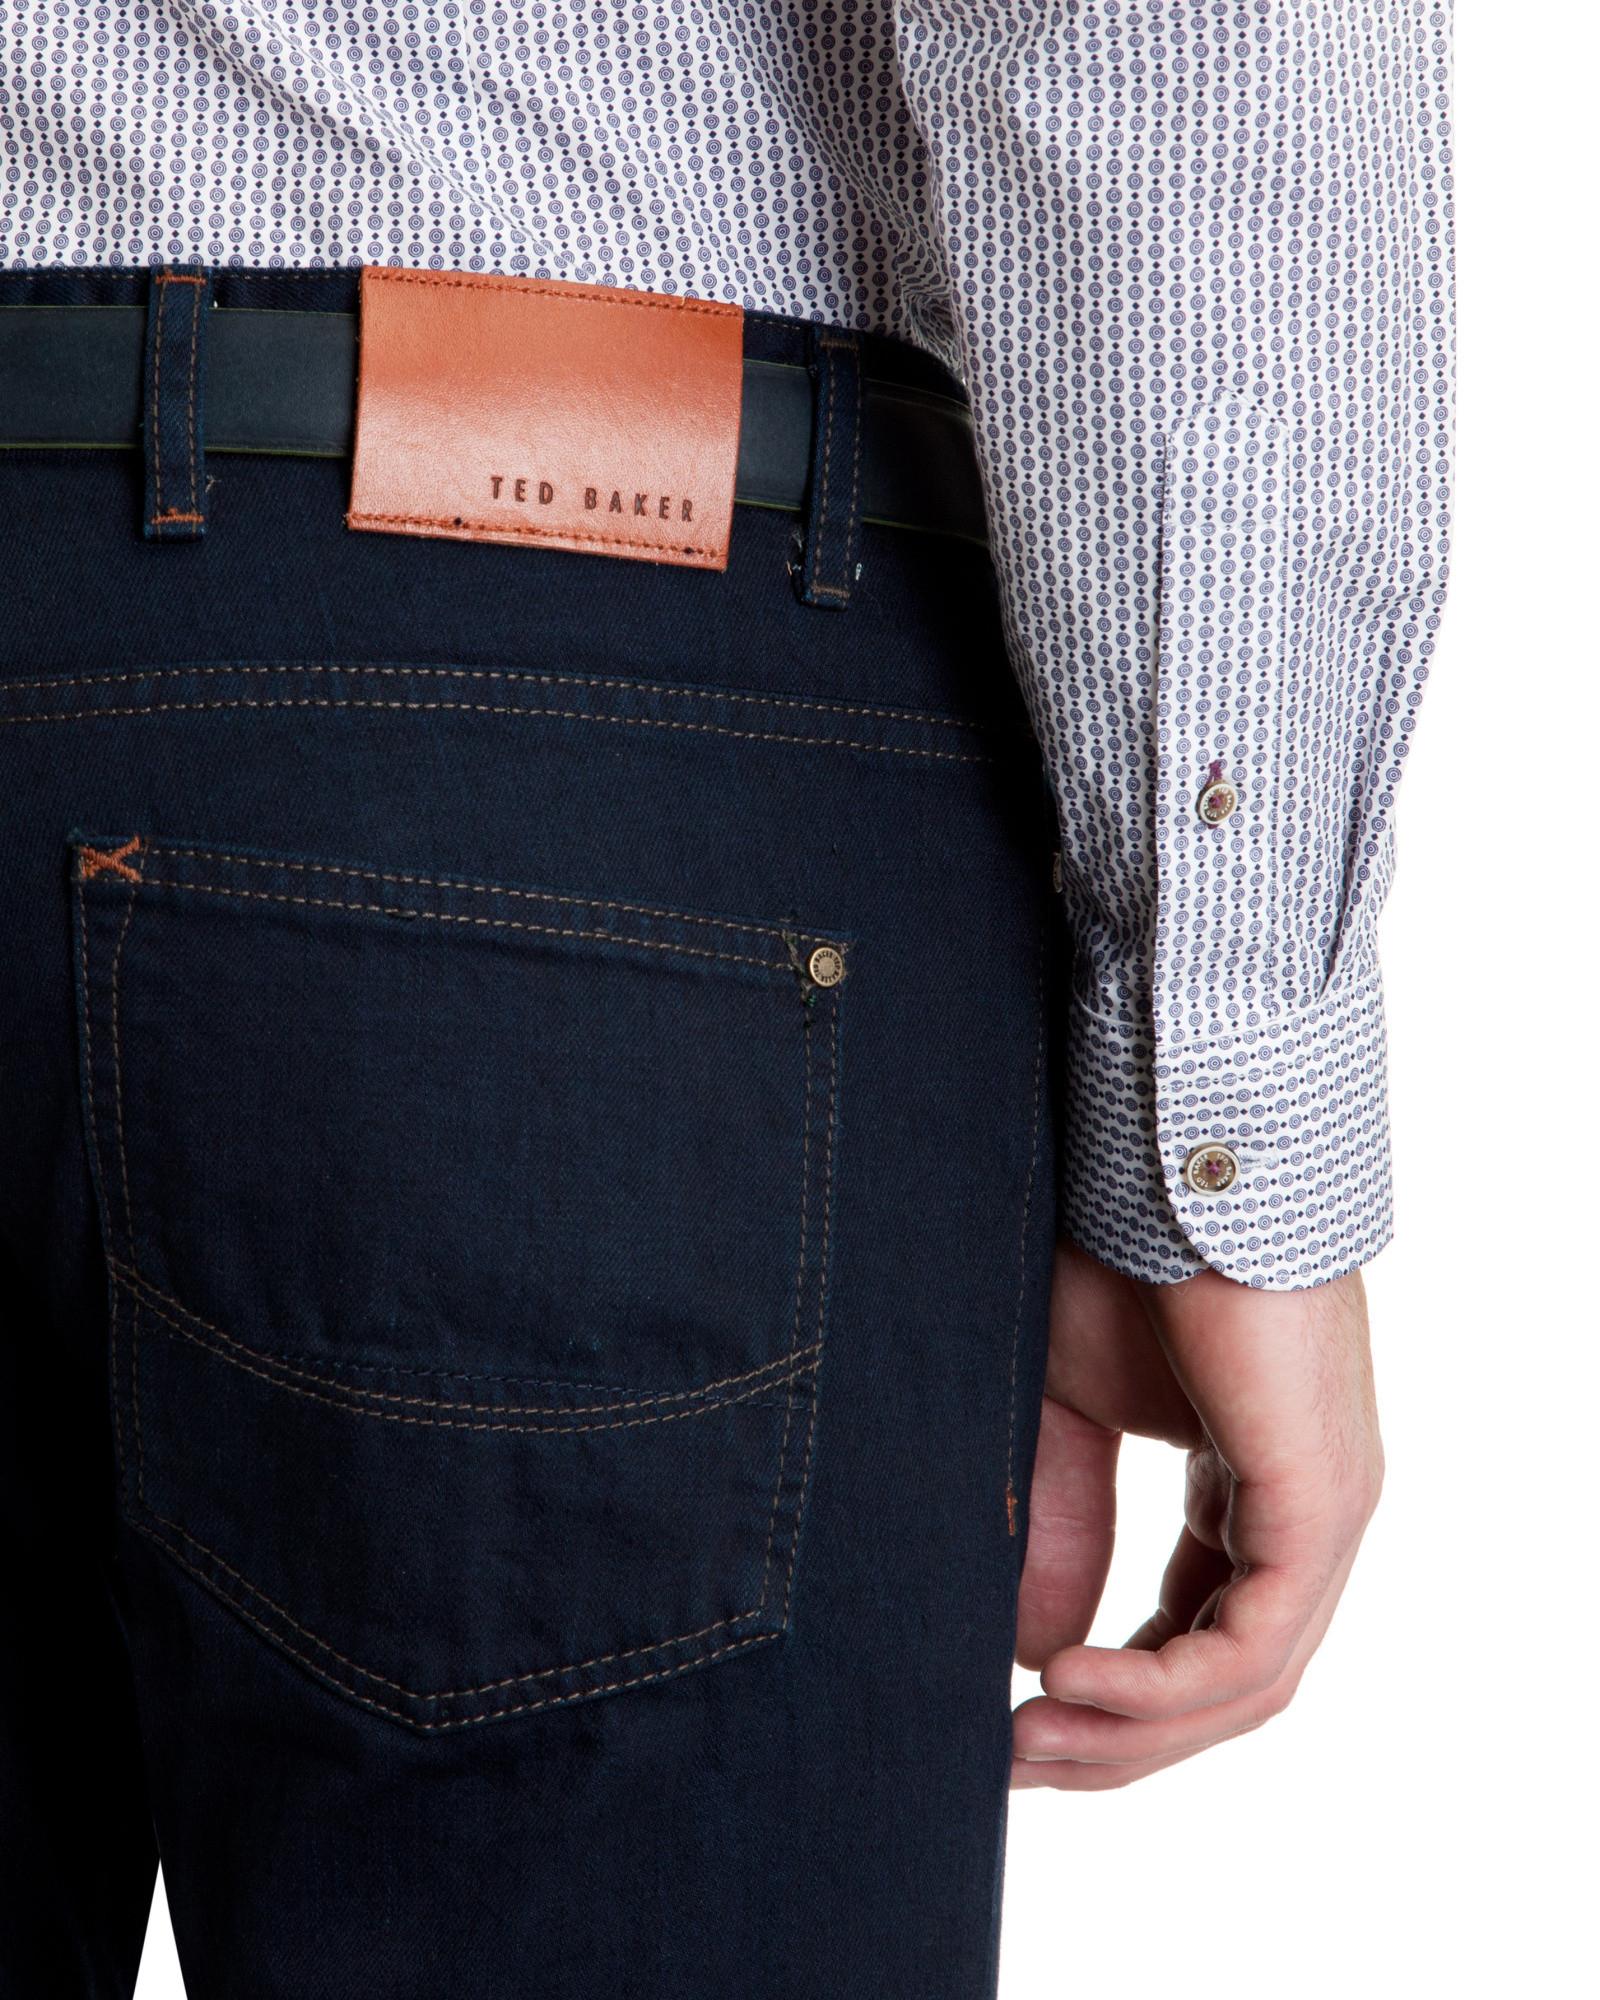 84a8d1bcf Lyst - Ted Baker Selsey Slim Fit Denim Jeans in Blue for Men